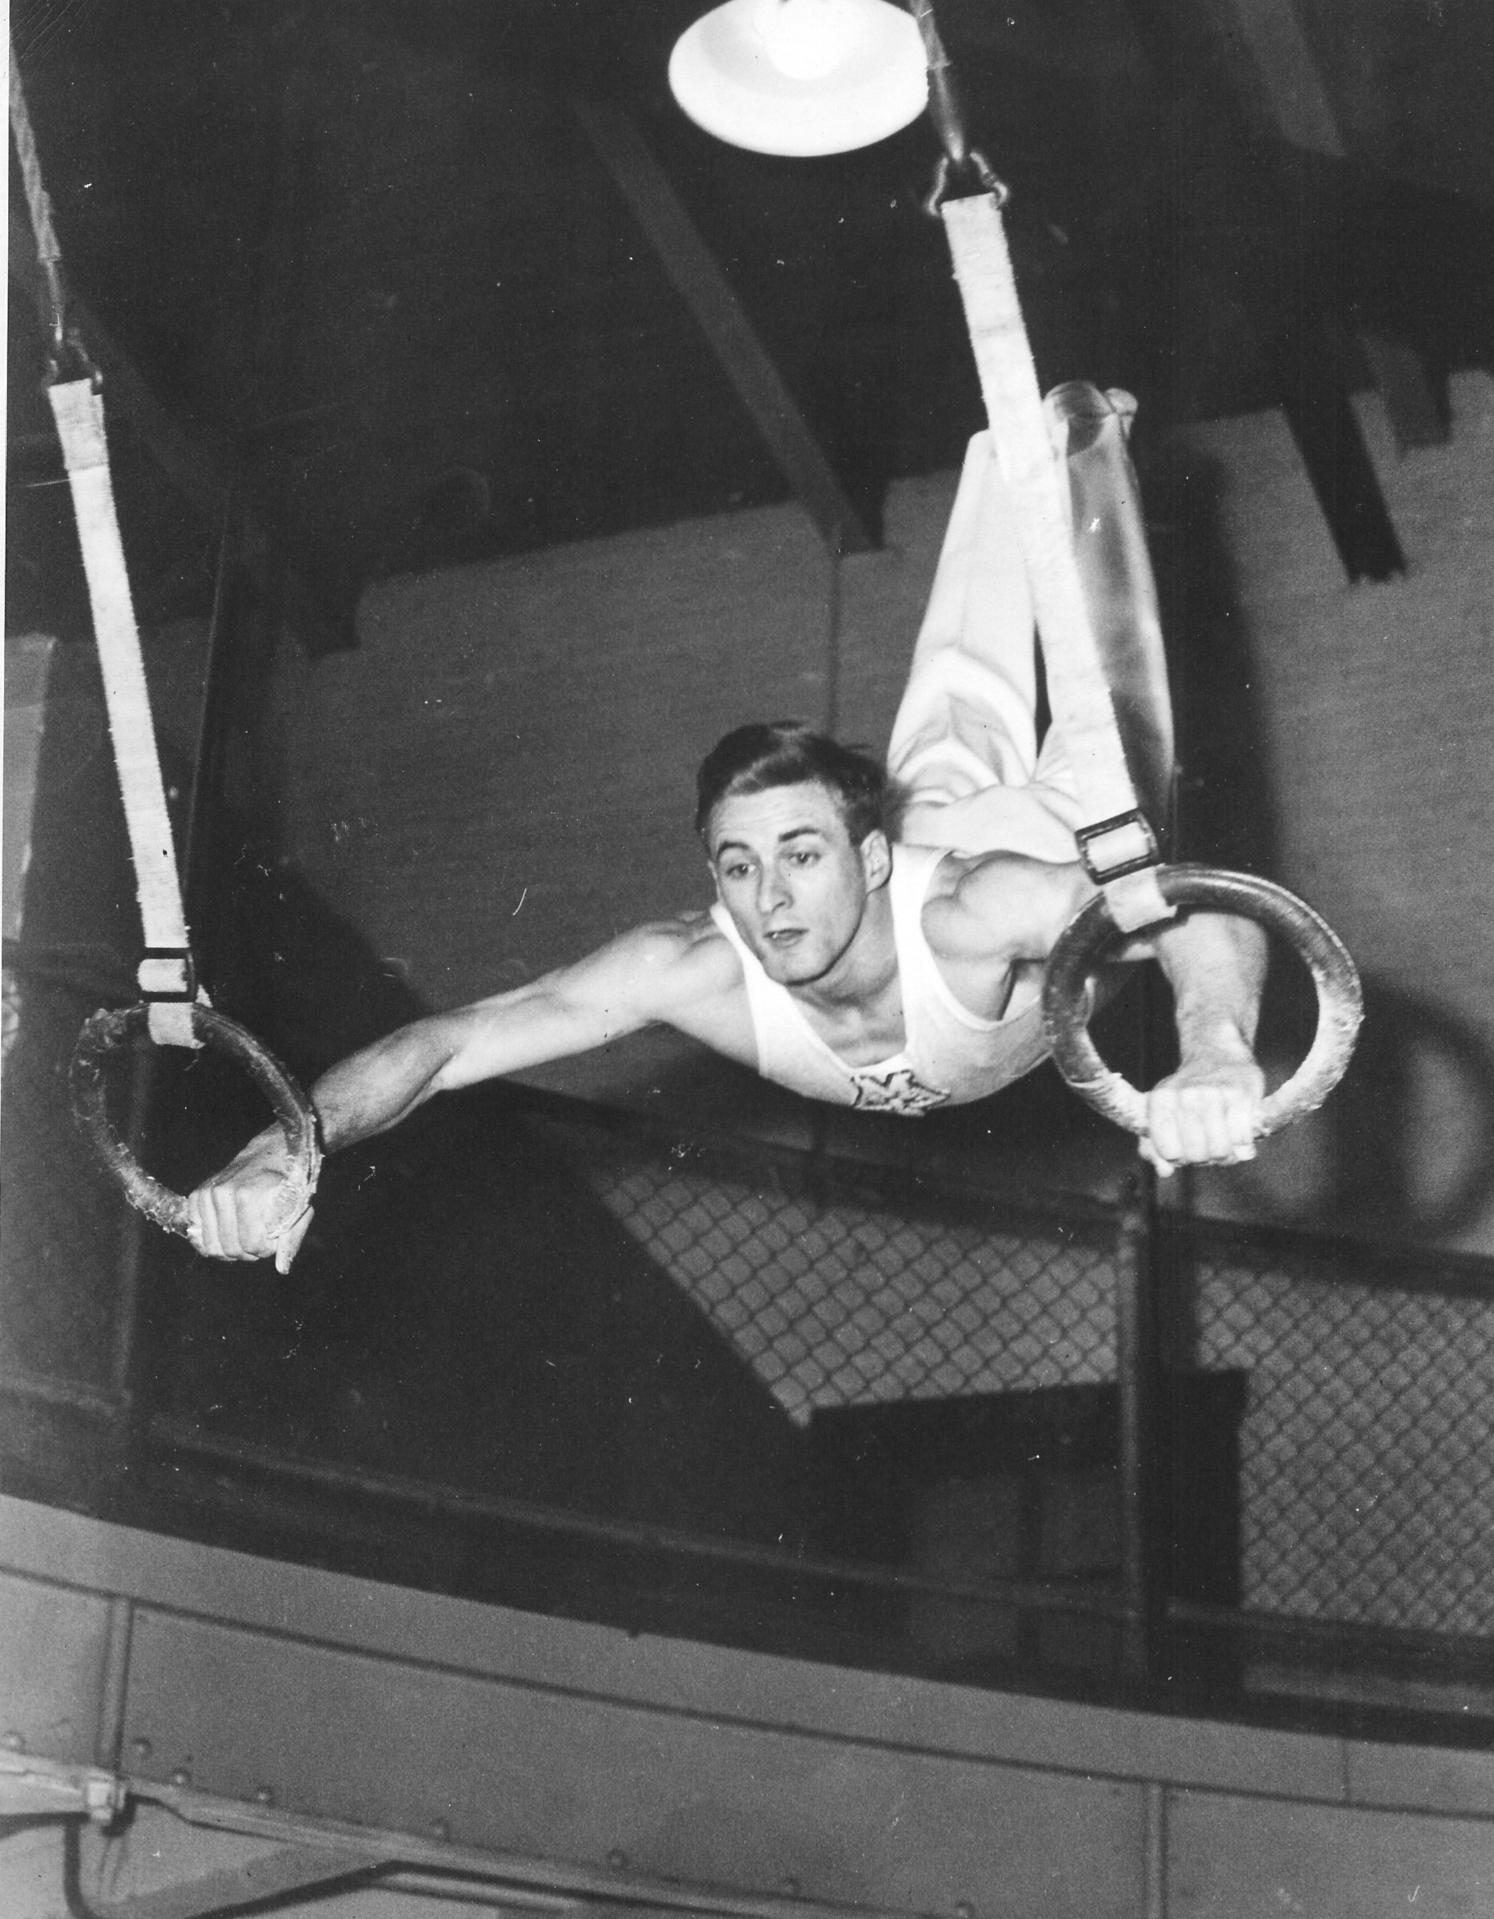 Al Kuckhoff on the Flying Rings (1950)